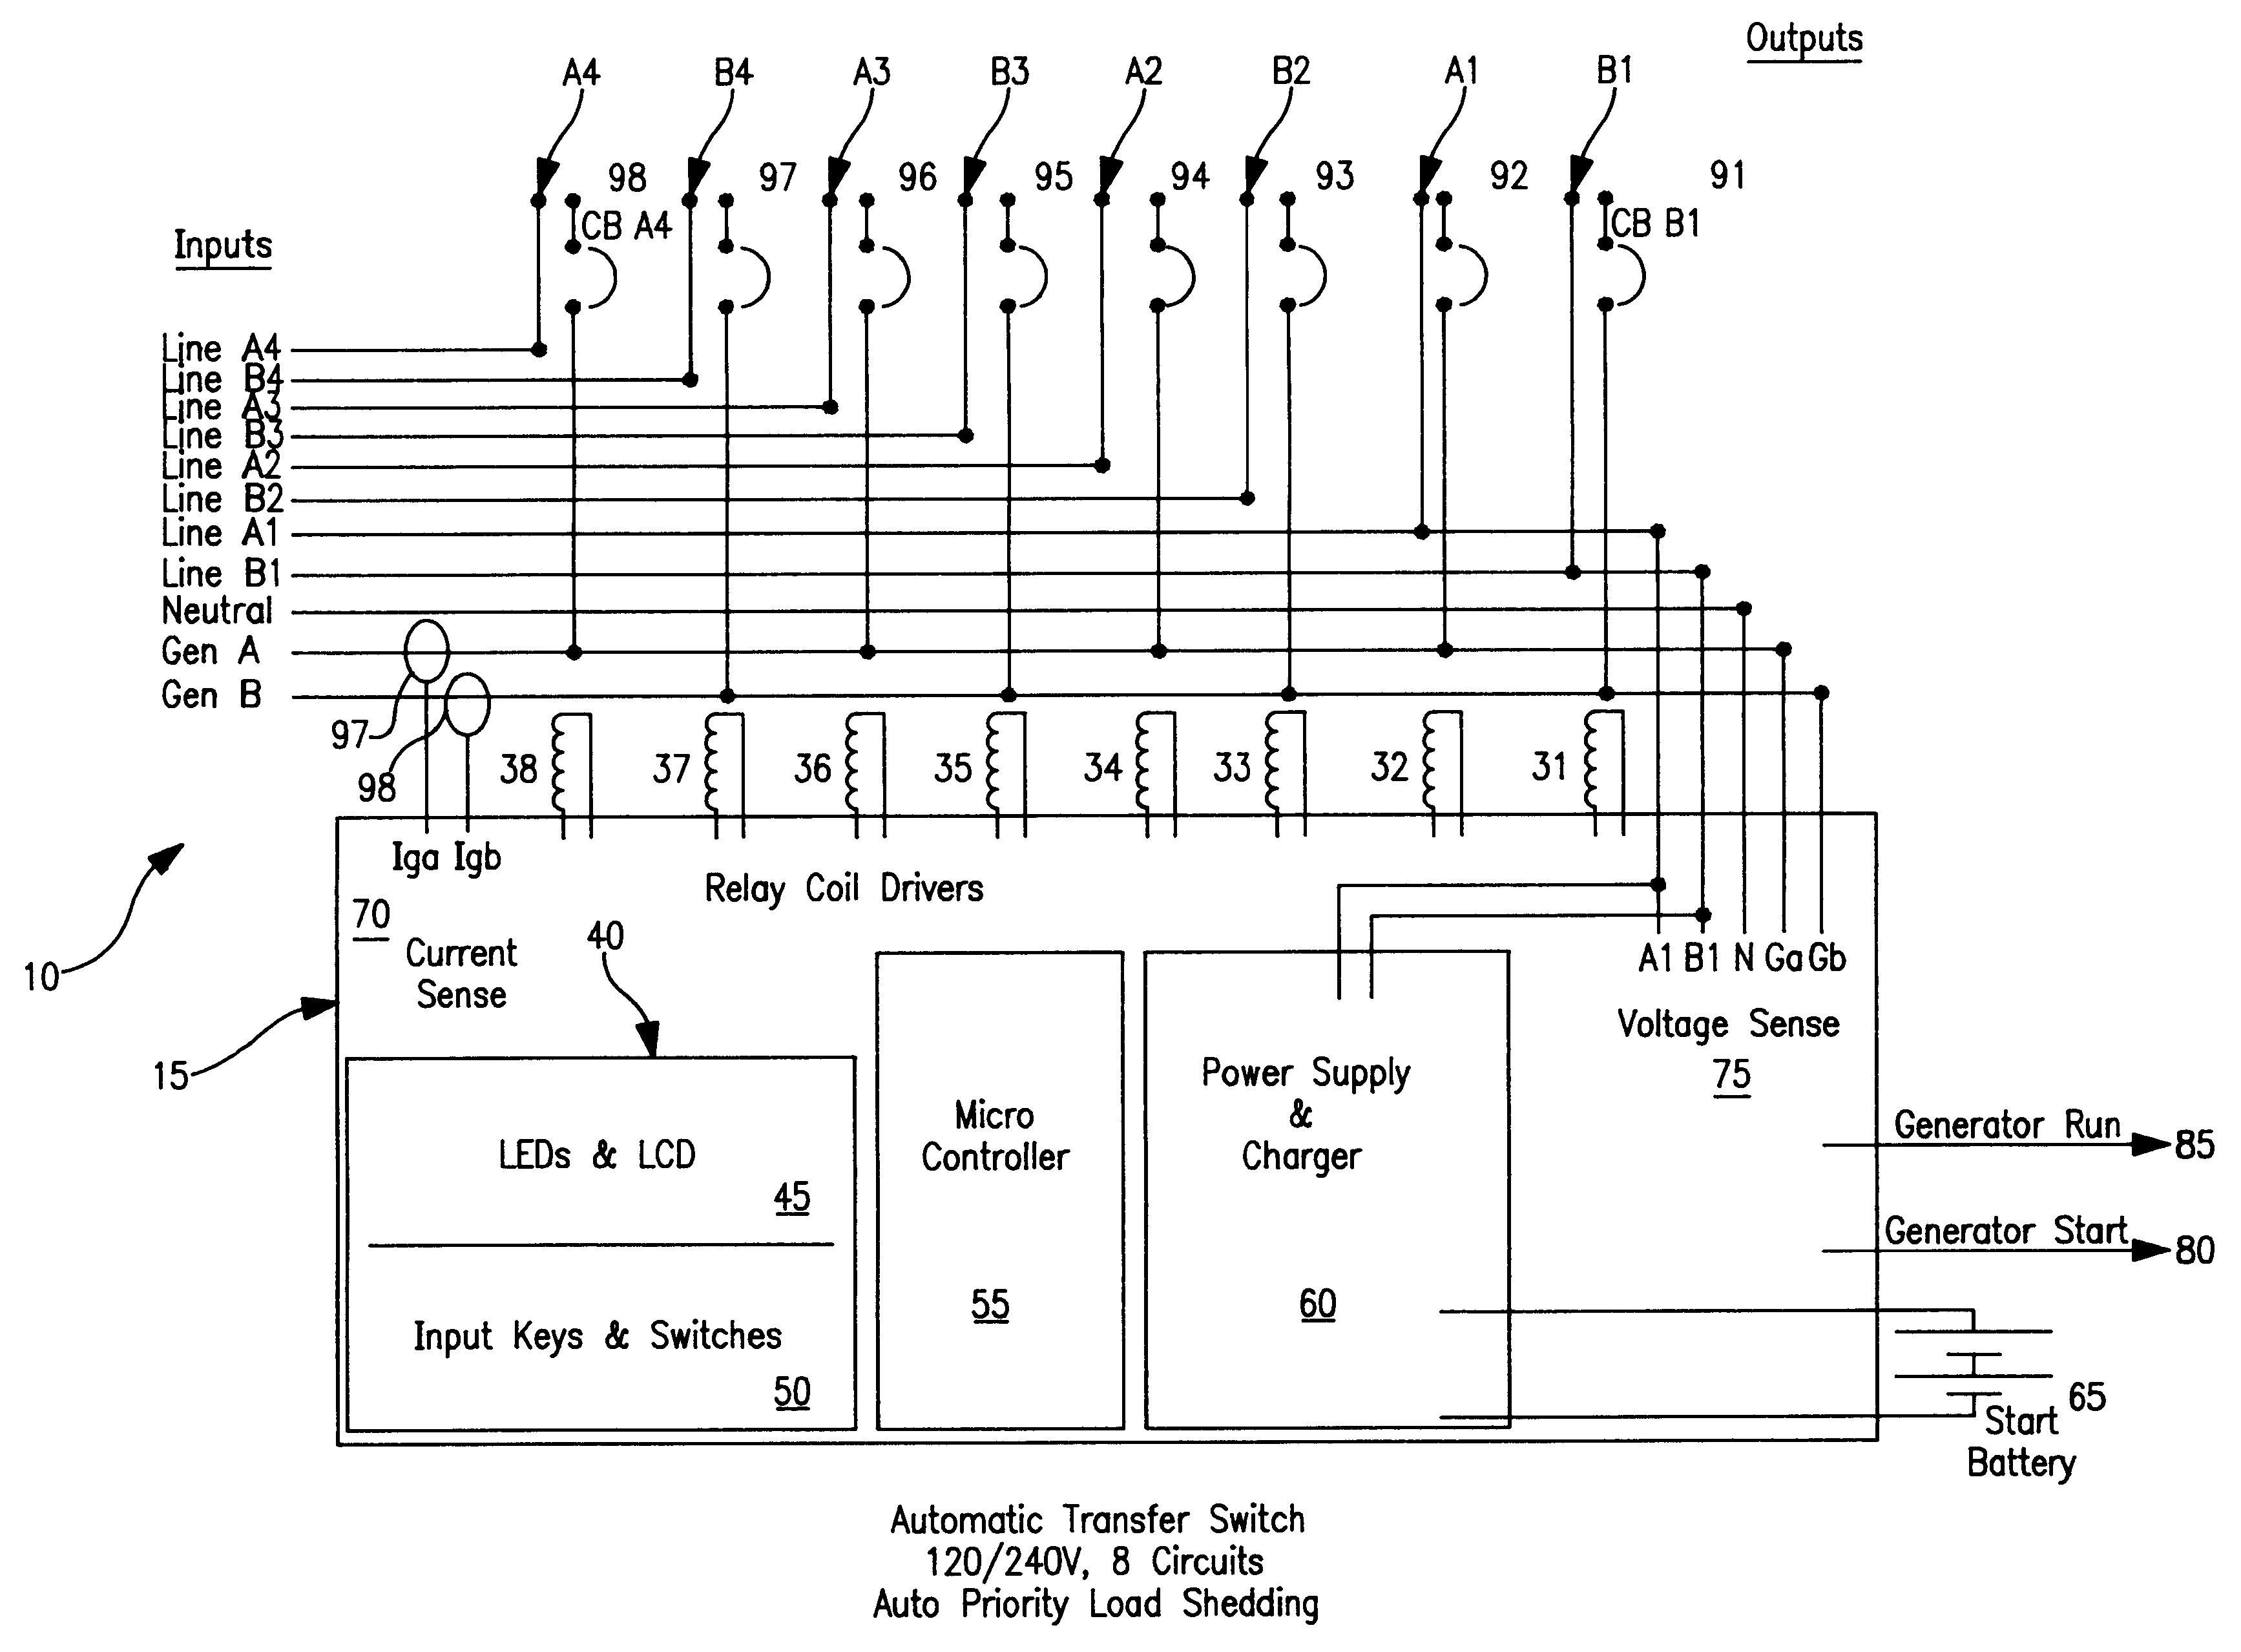 Fabulous Generac 200 Amp Transfer Switch Wiring Diagram Example Of Portable Wiring Cloud Onicaalyptbenolwigegmohammedshrineorg